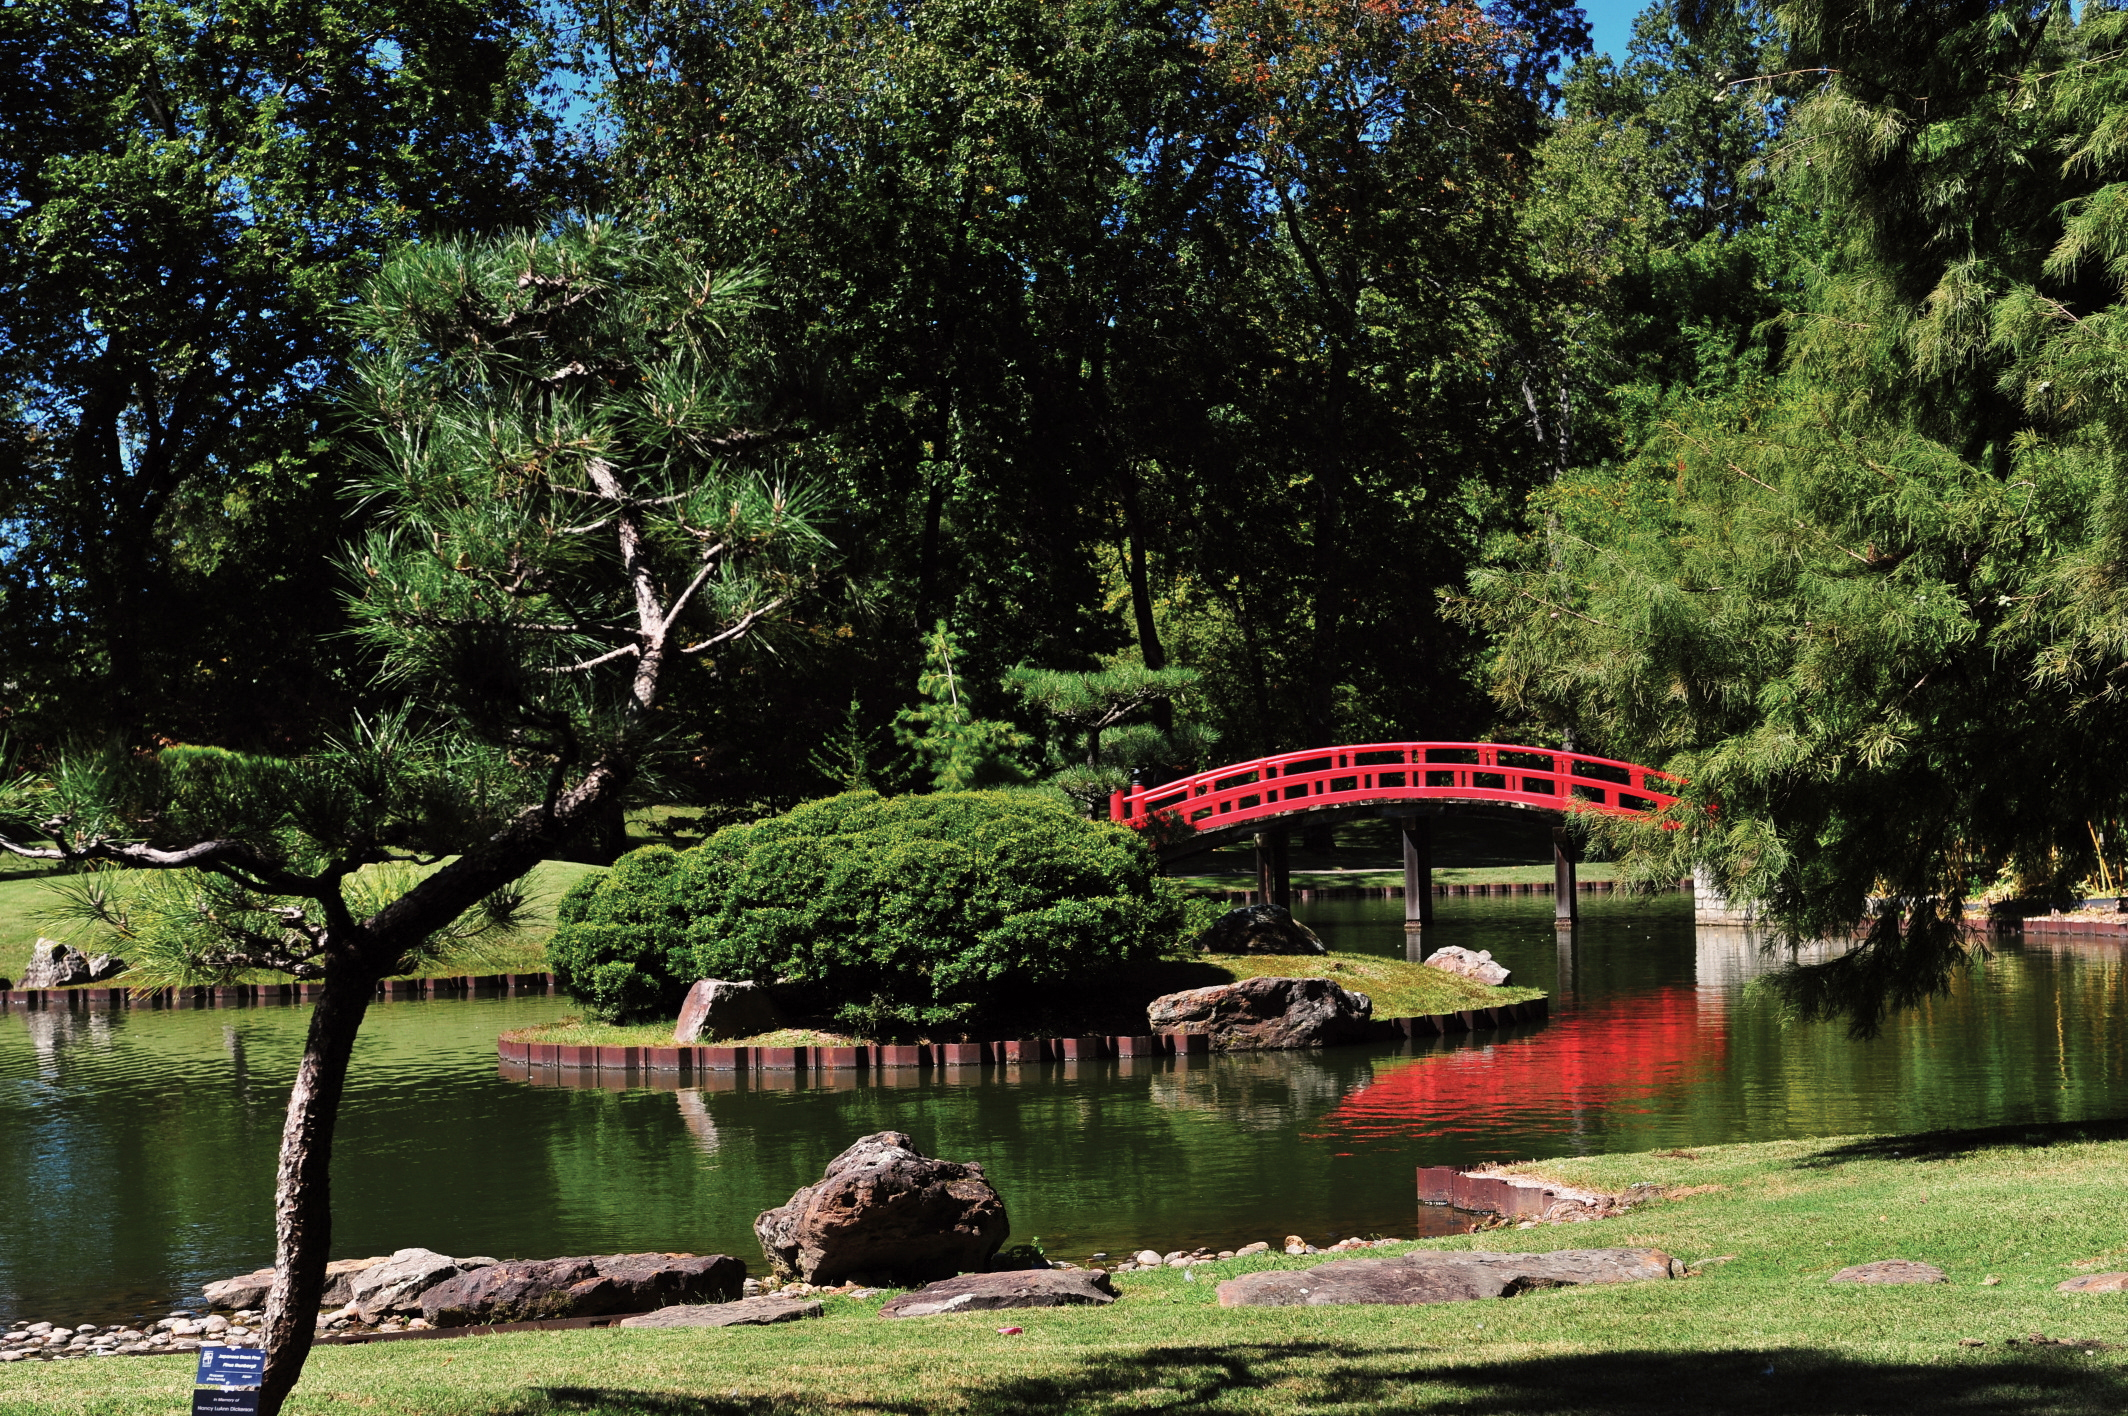 Visit the Memphis Botanic Garden For Over 90 Acres of Activities!